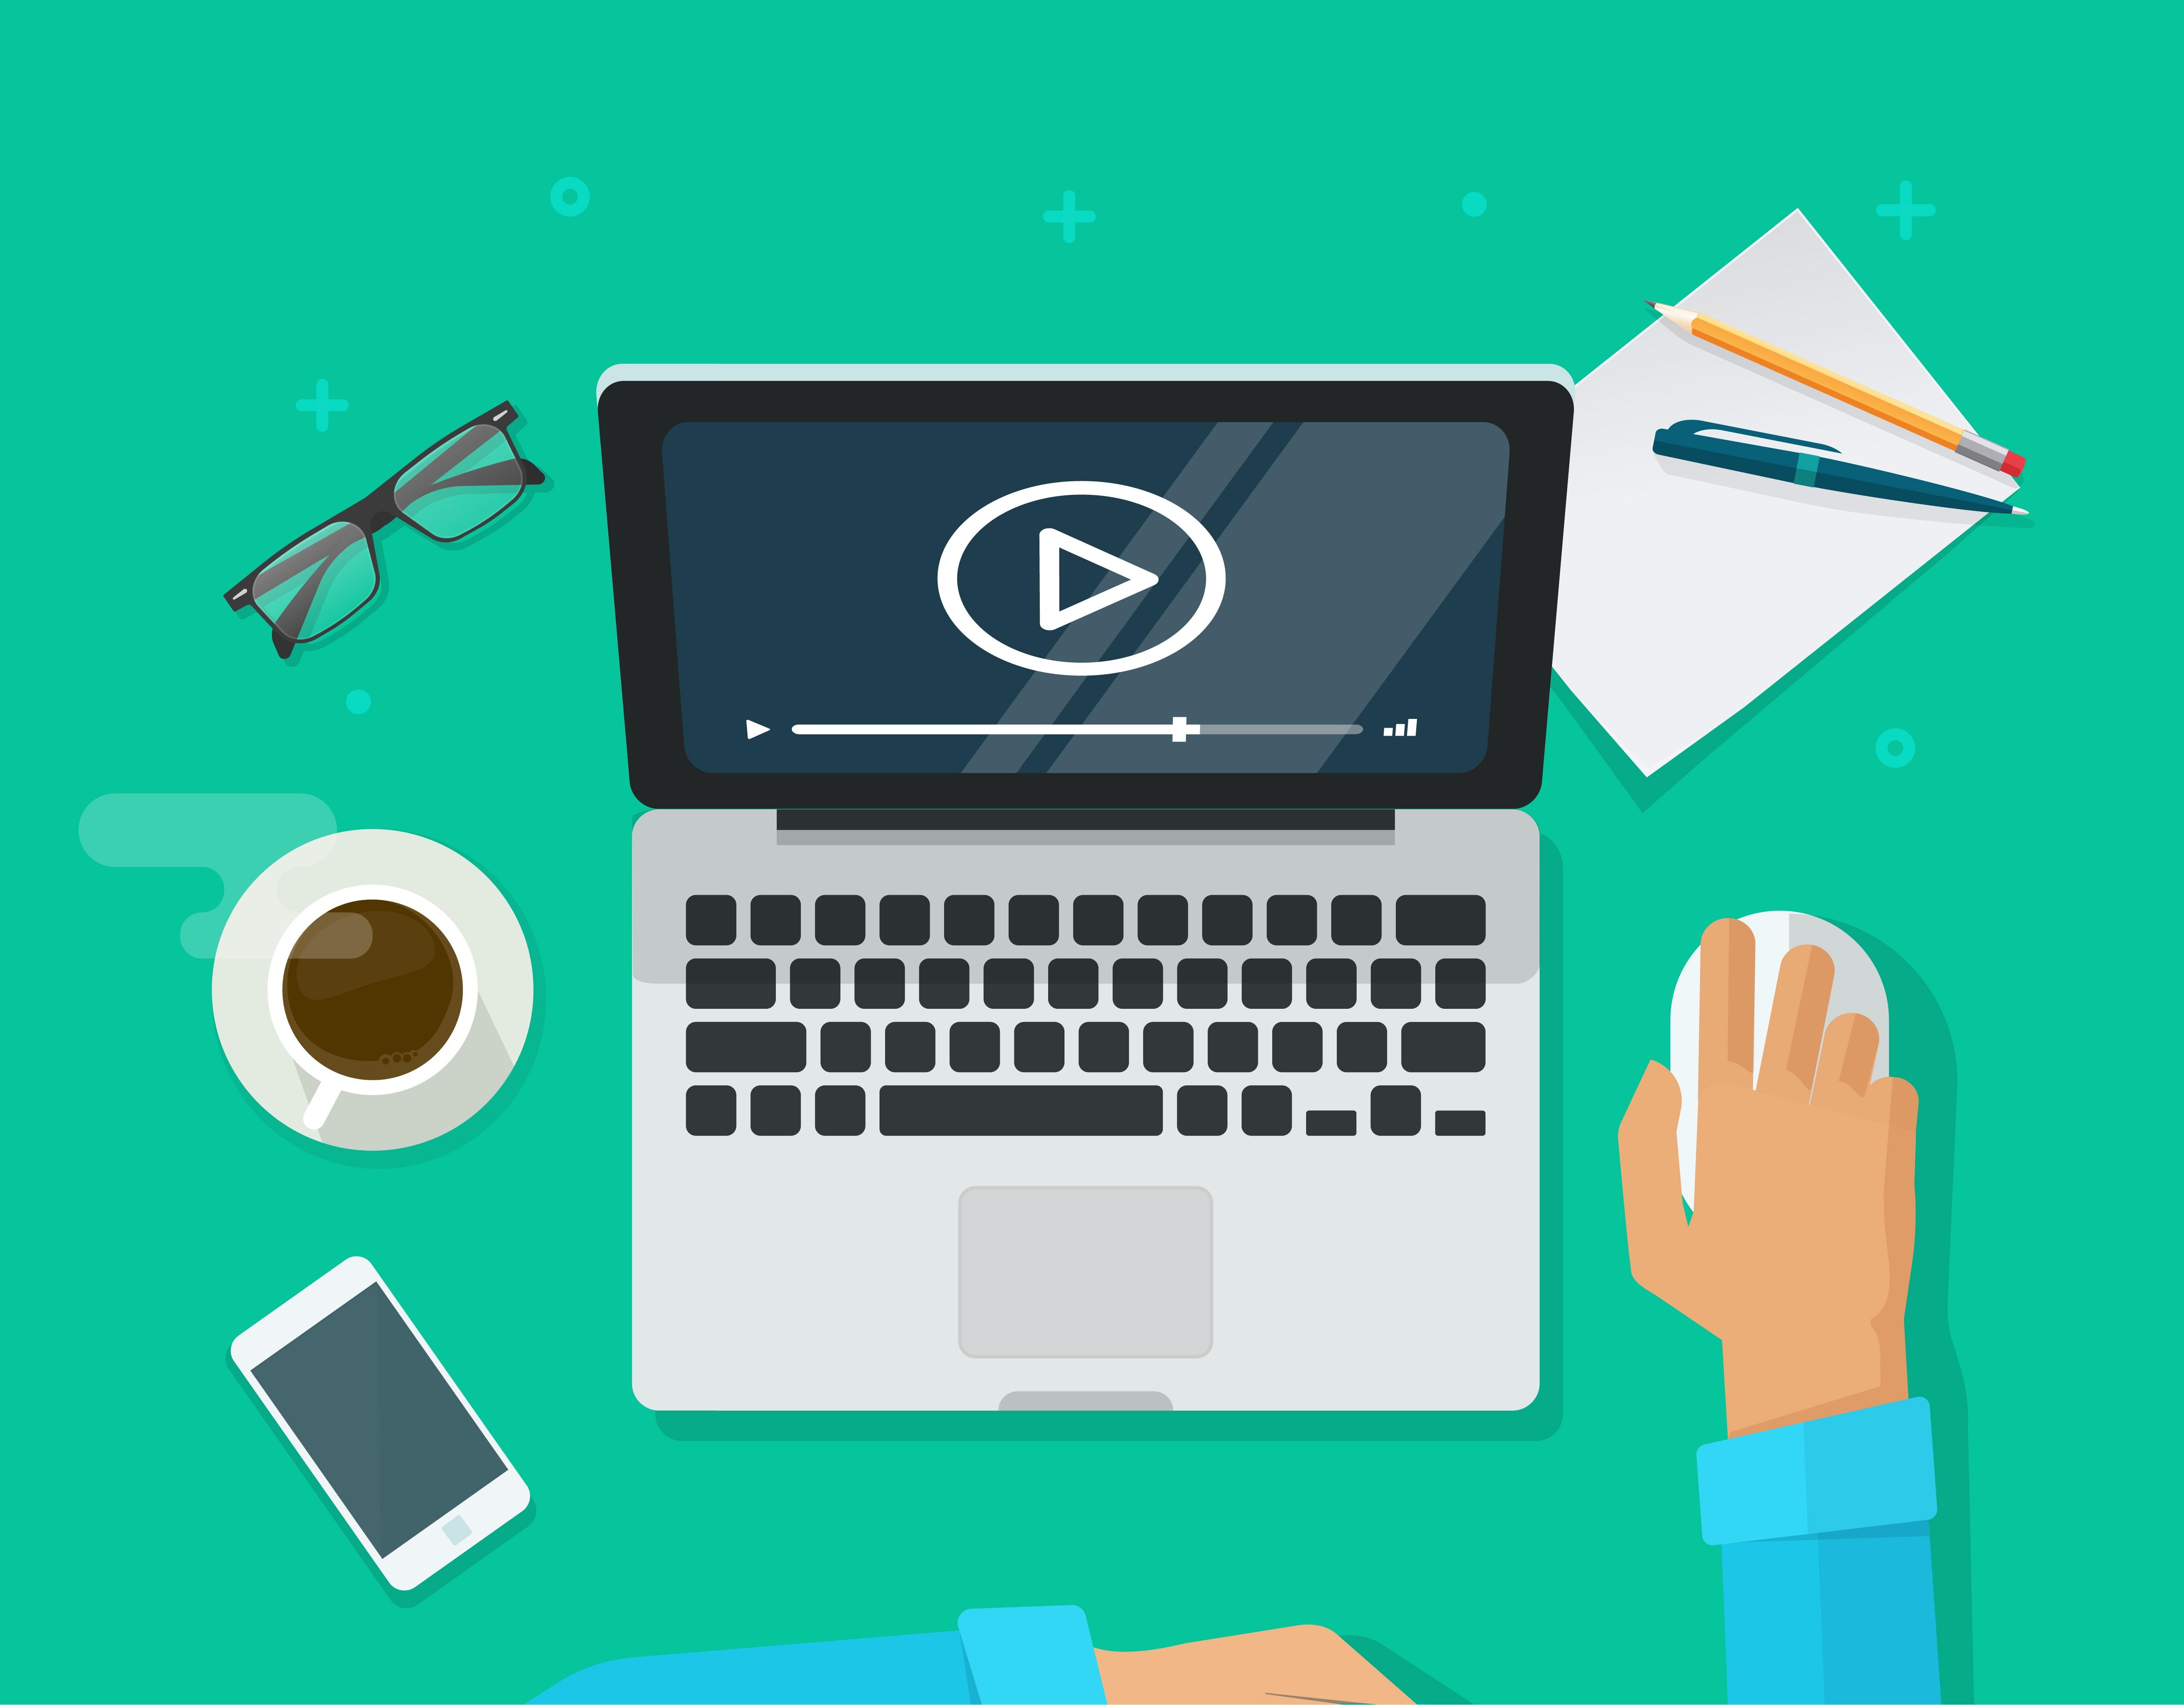 online eyecare practice learning